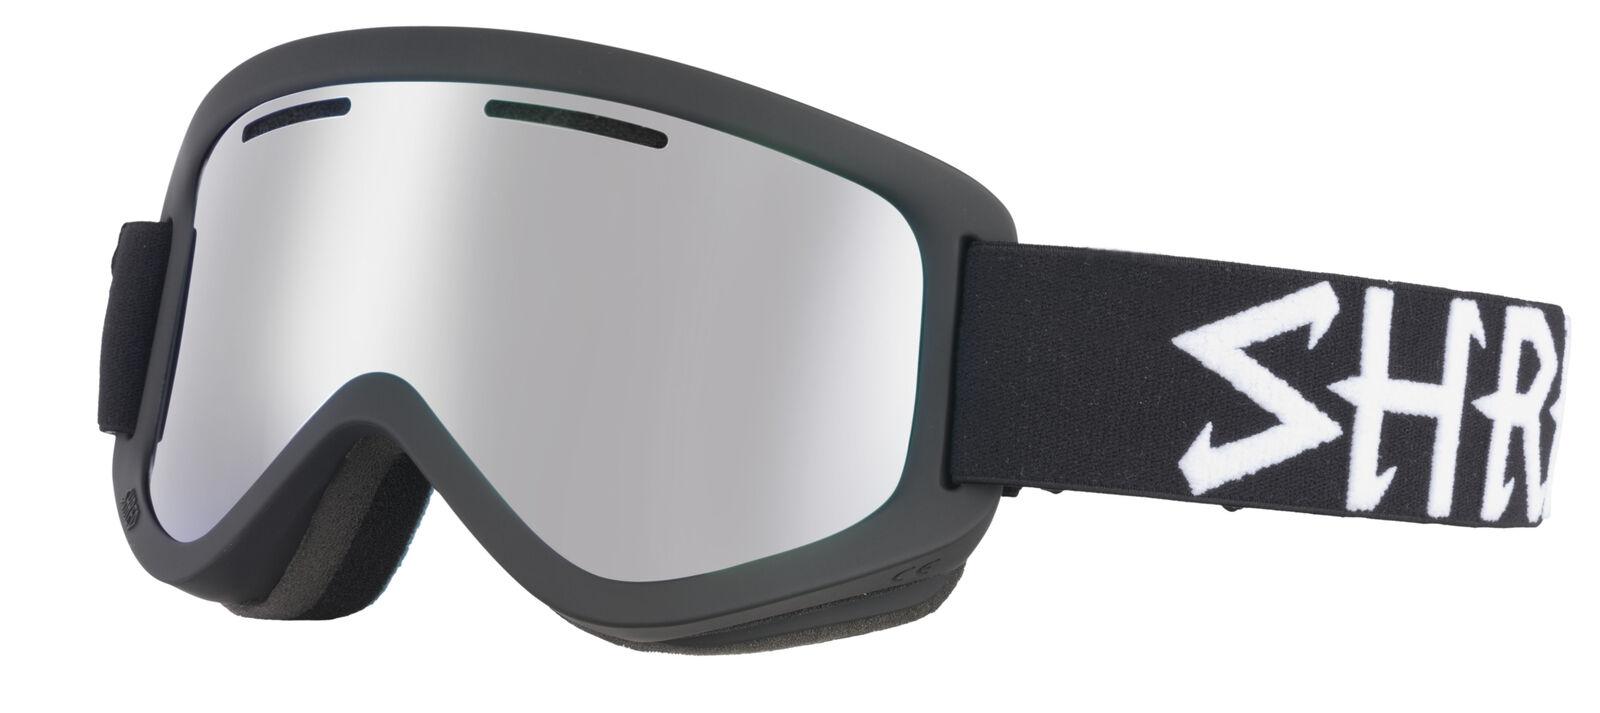 Shred Skibrille Snowboardbrille WONDERFY ECLIPSE PLATINUM black